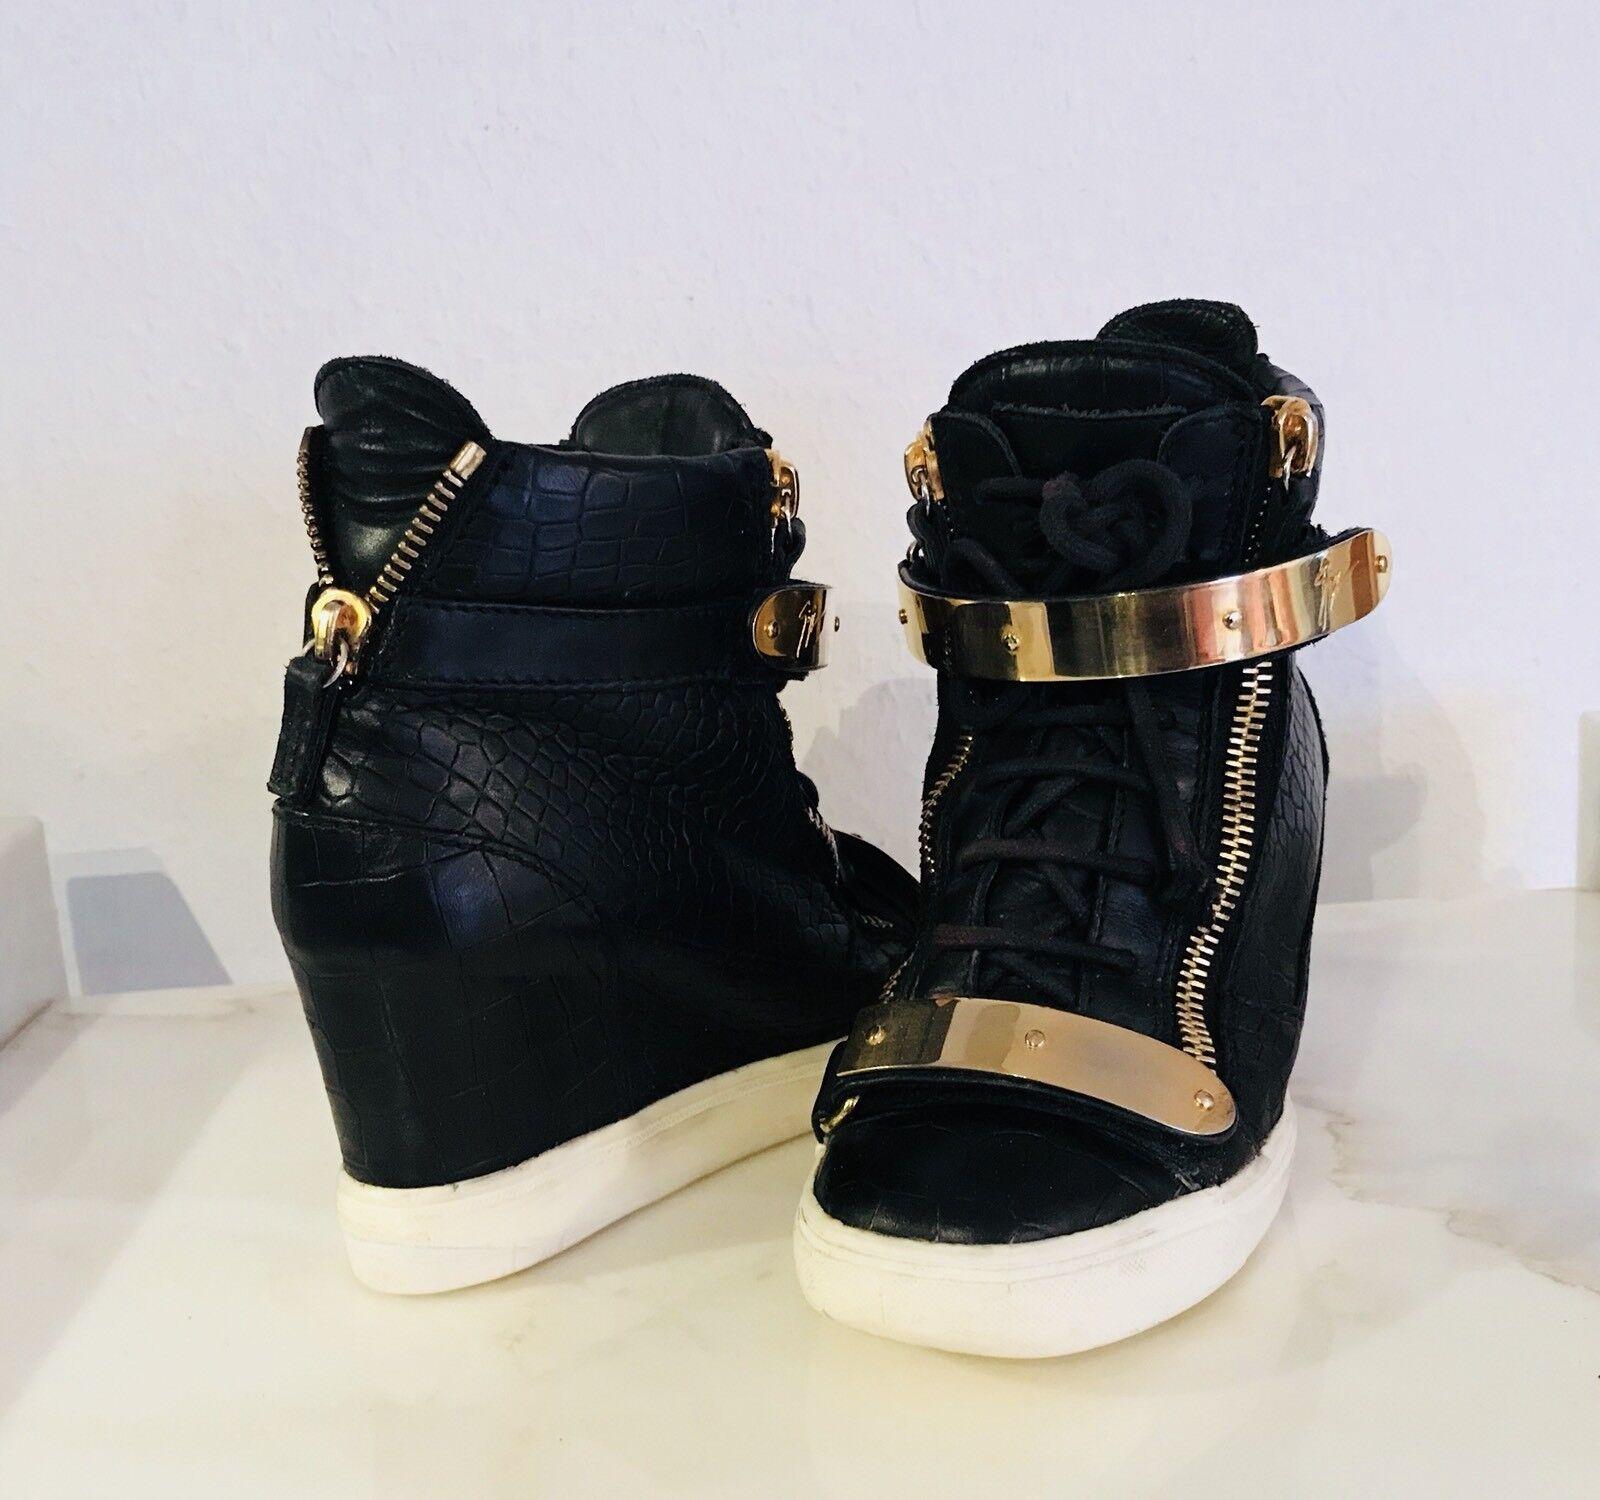 Guiseppe Zanotti Sneaker Leder Kroko Optik mit Rechnung Größe 37